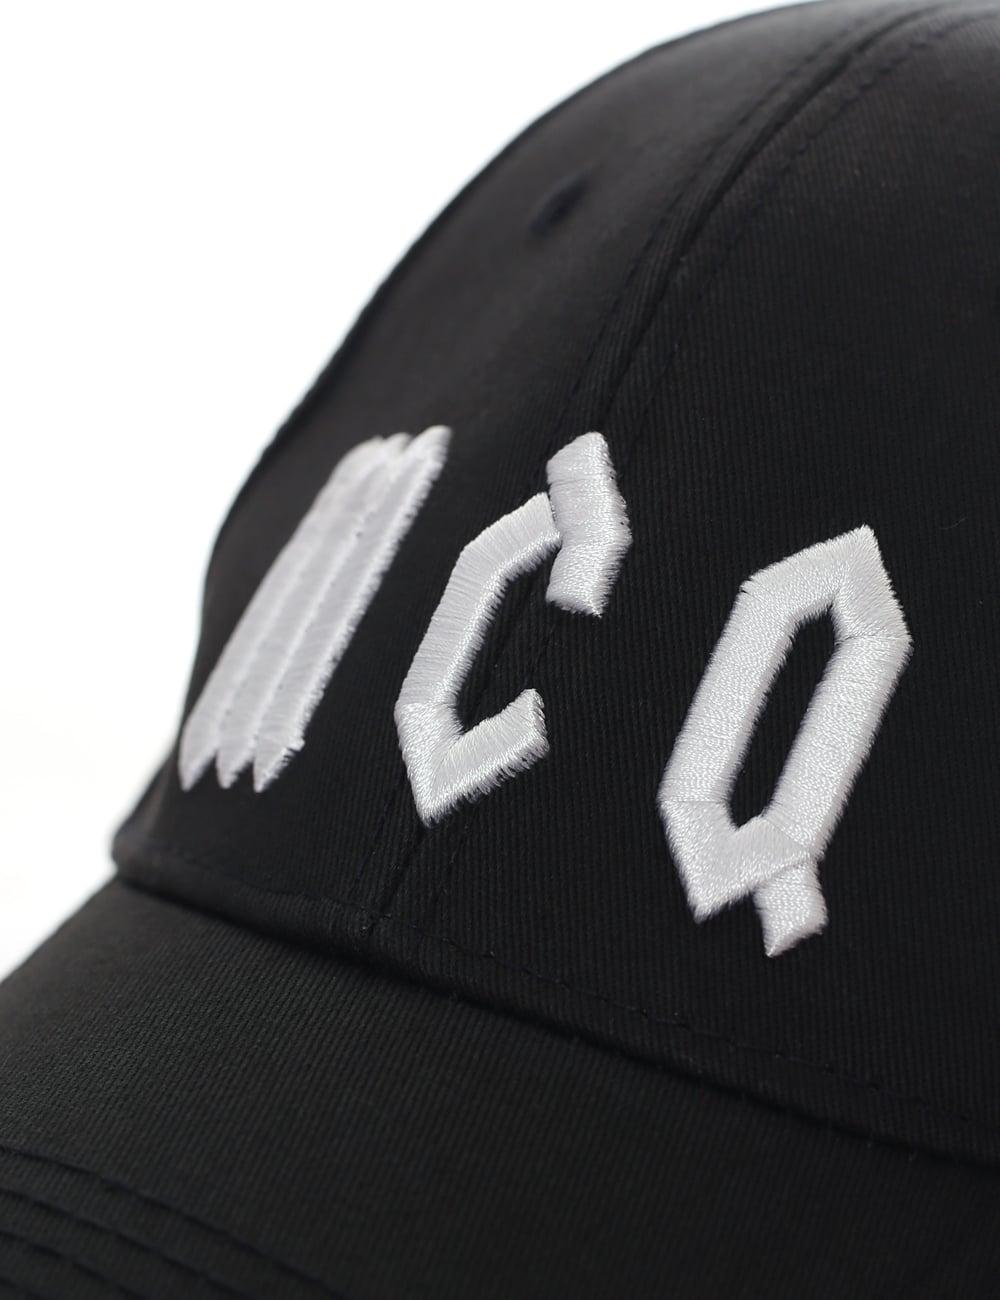 2fcc1923 Tap image to zoom. Men's Logo Baseball Cap